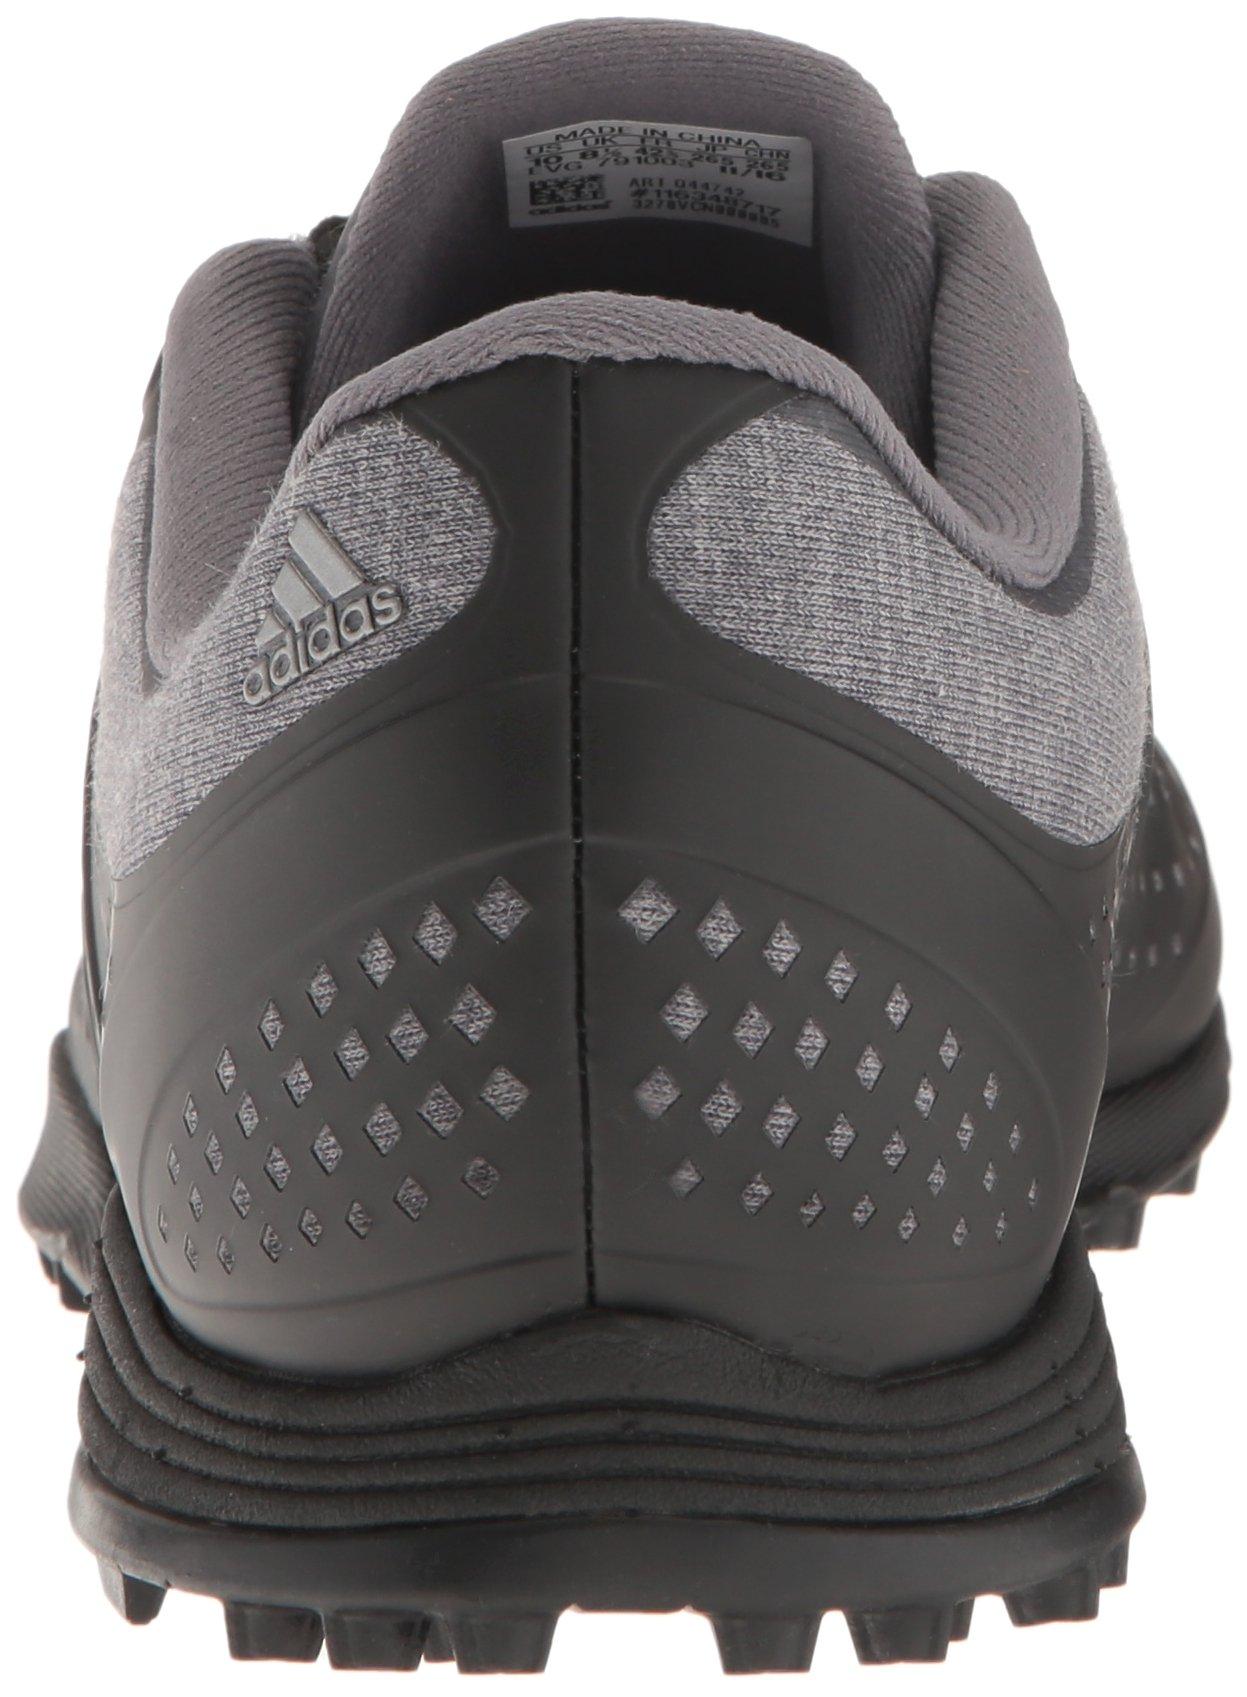 adidas Women's Adipure Sport Golf Shoe, Grey, 7 M US by adidas (Image #2)